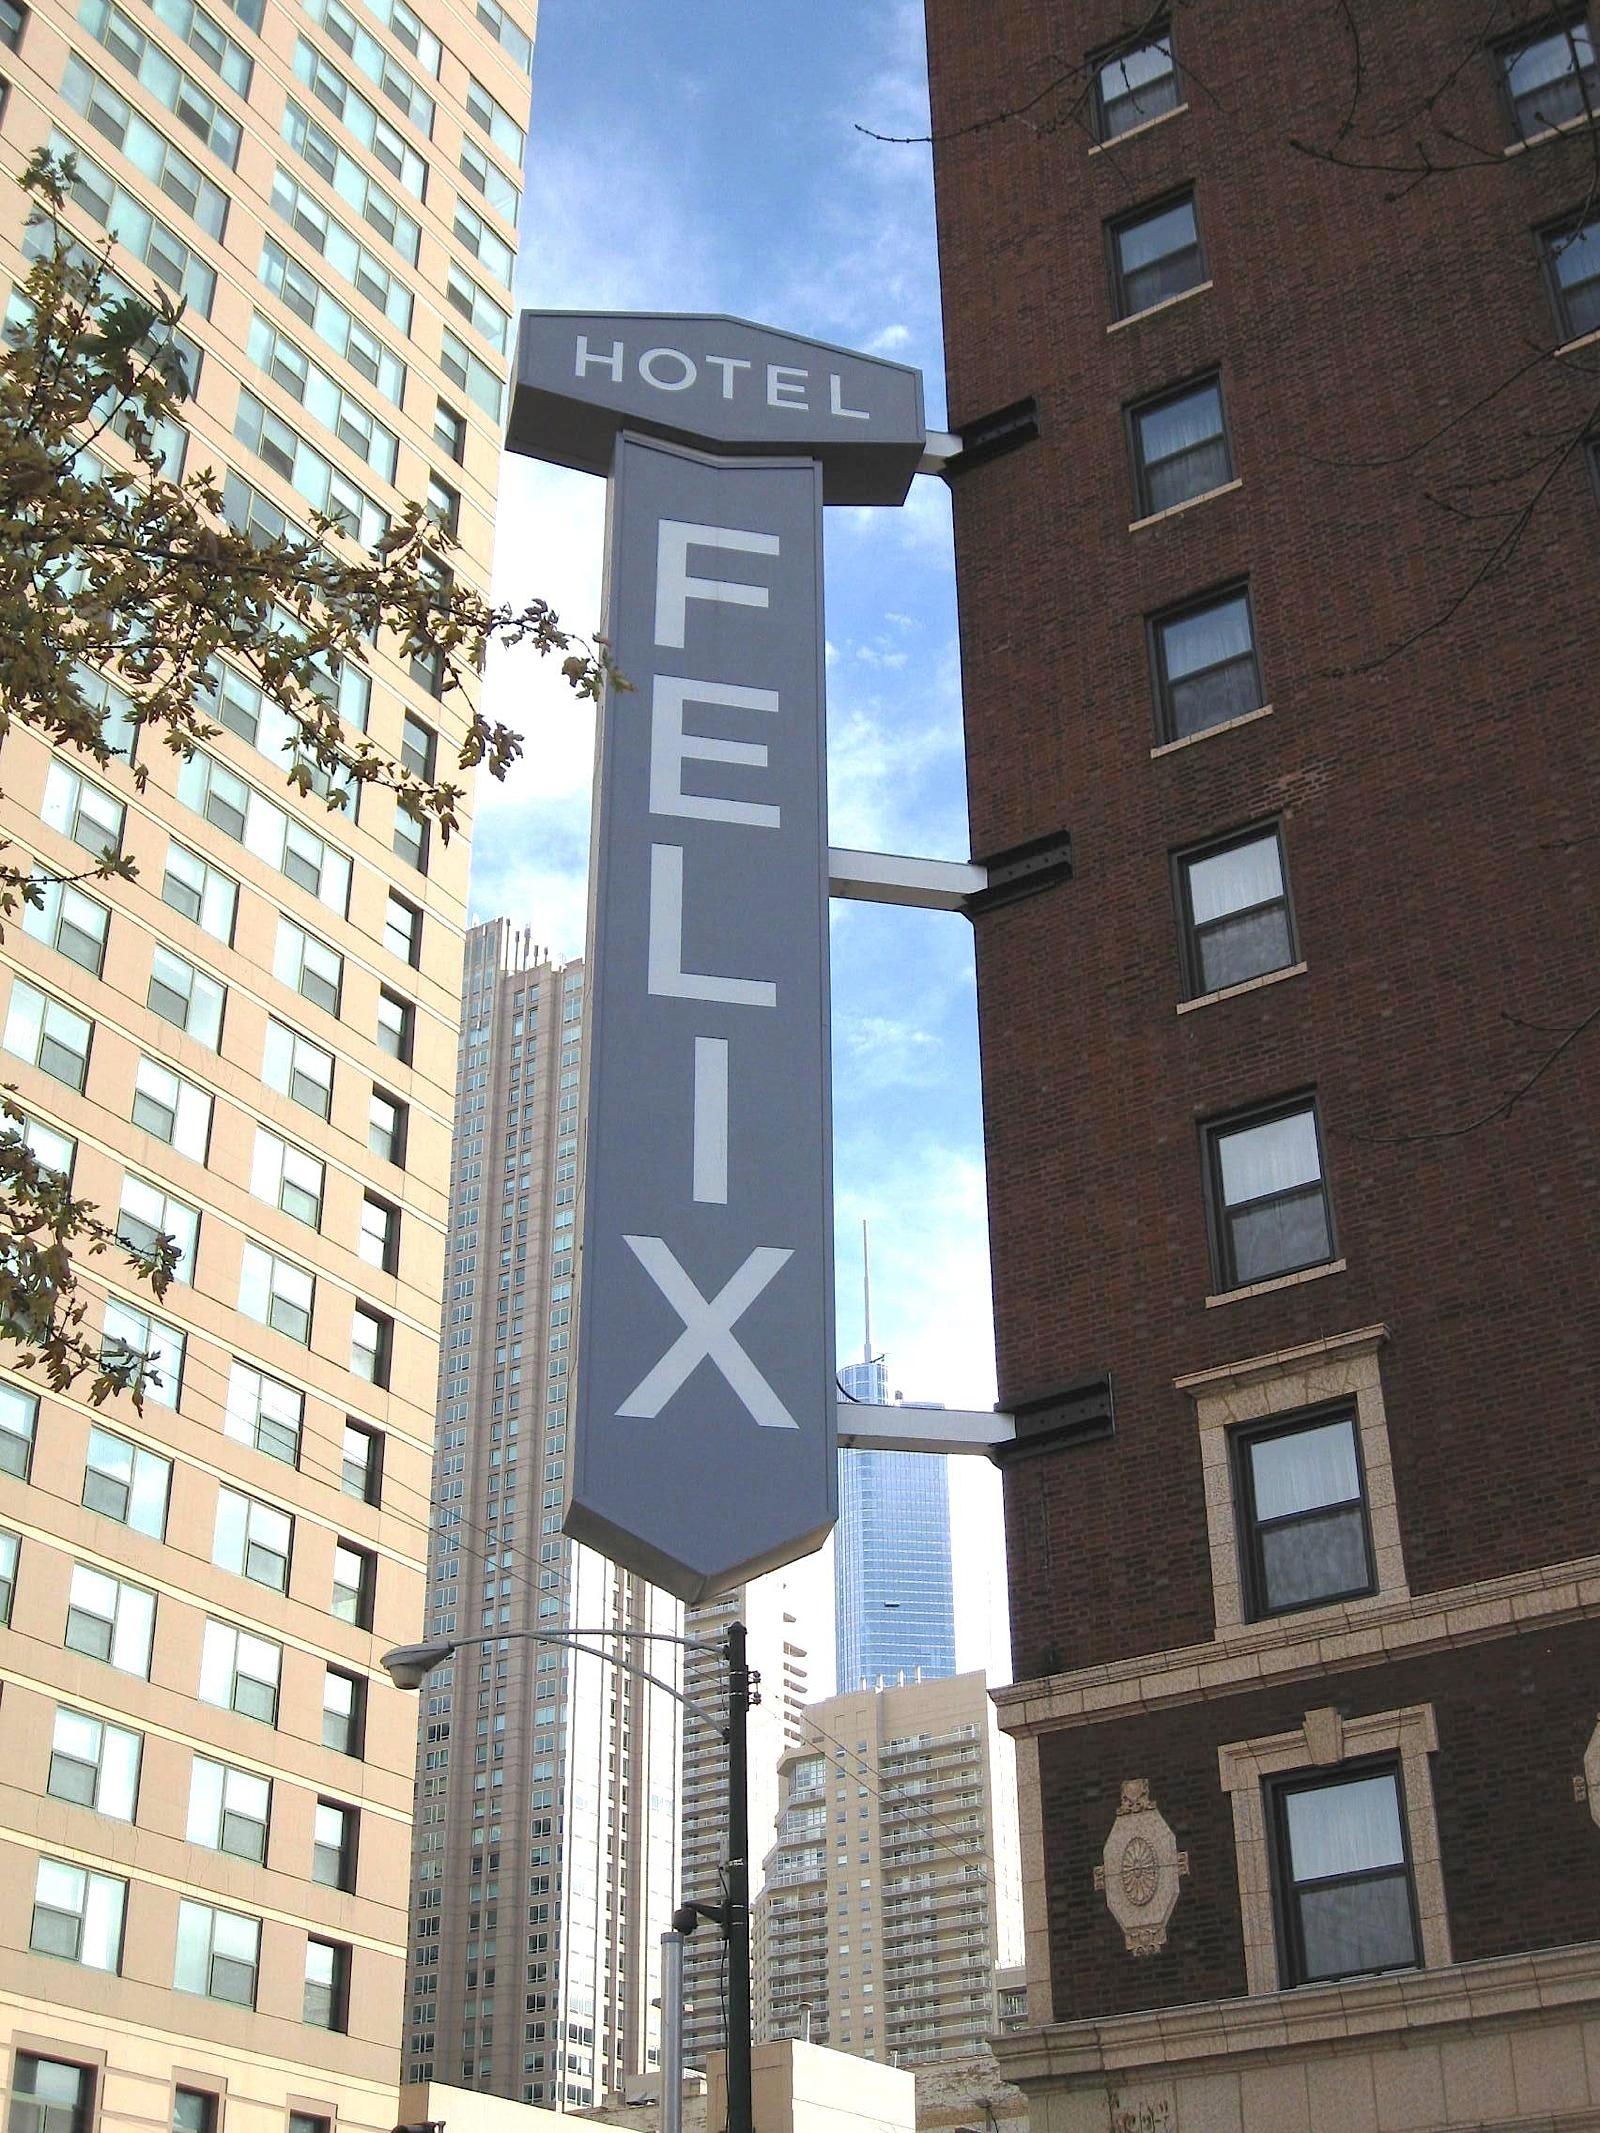 Hotel Felix image 0